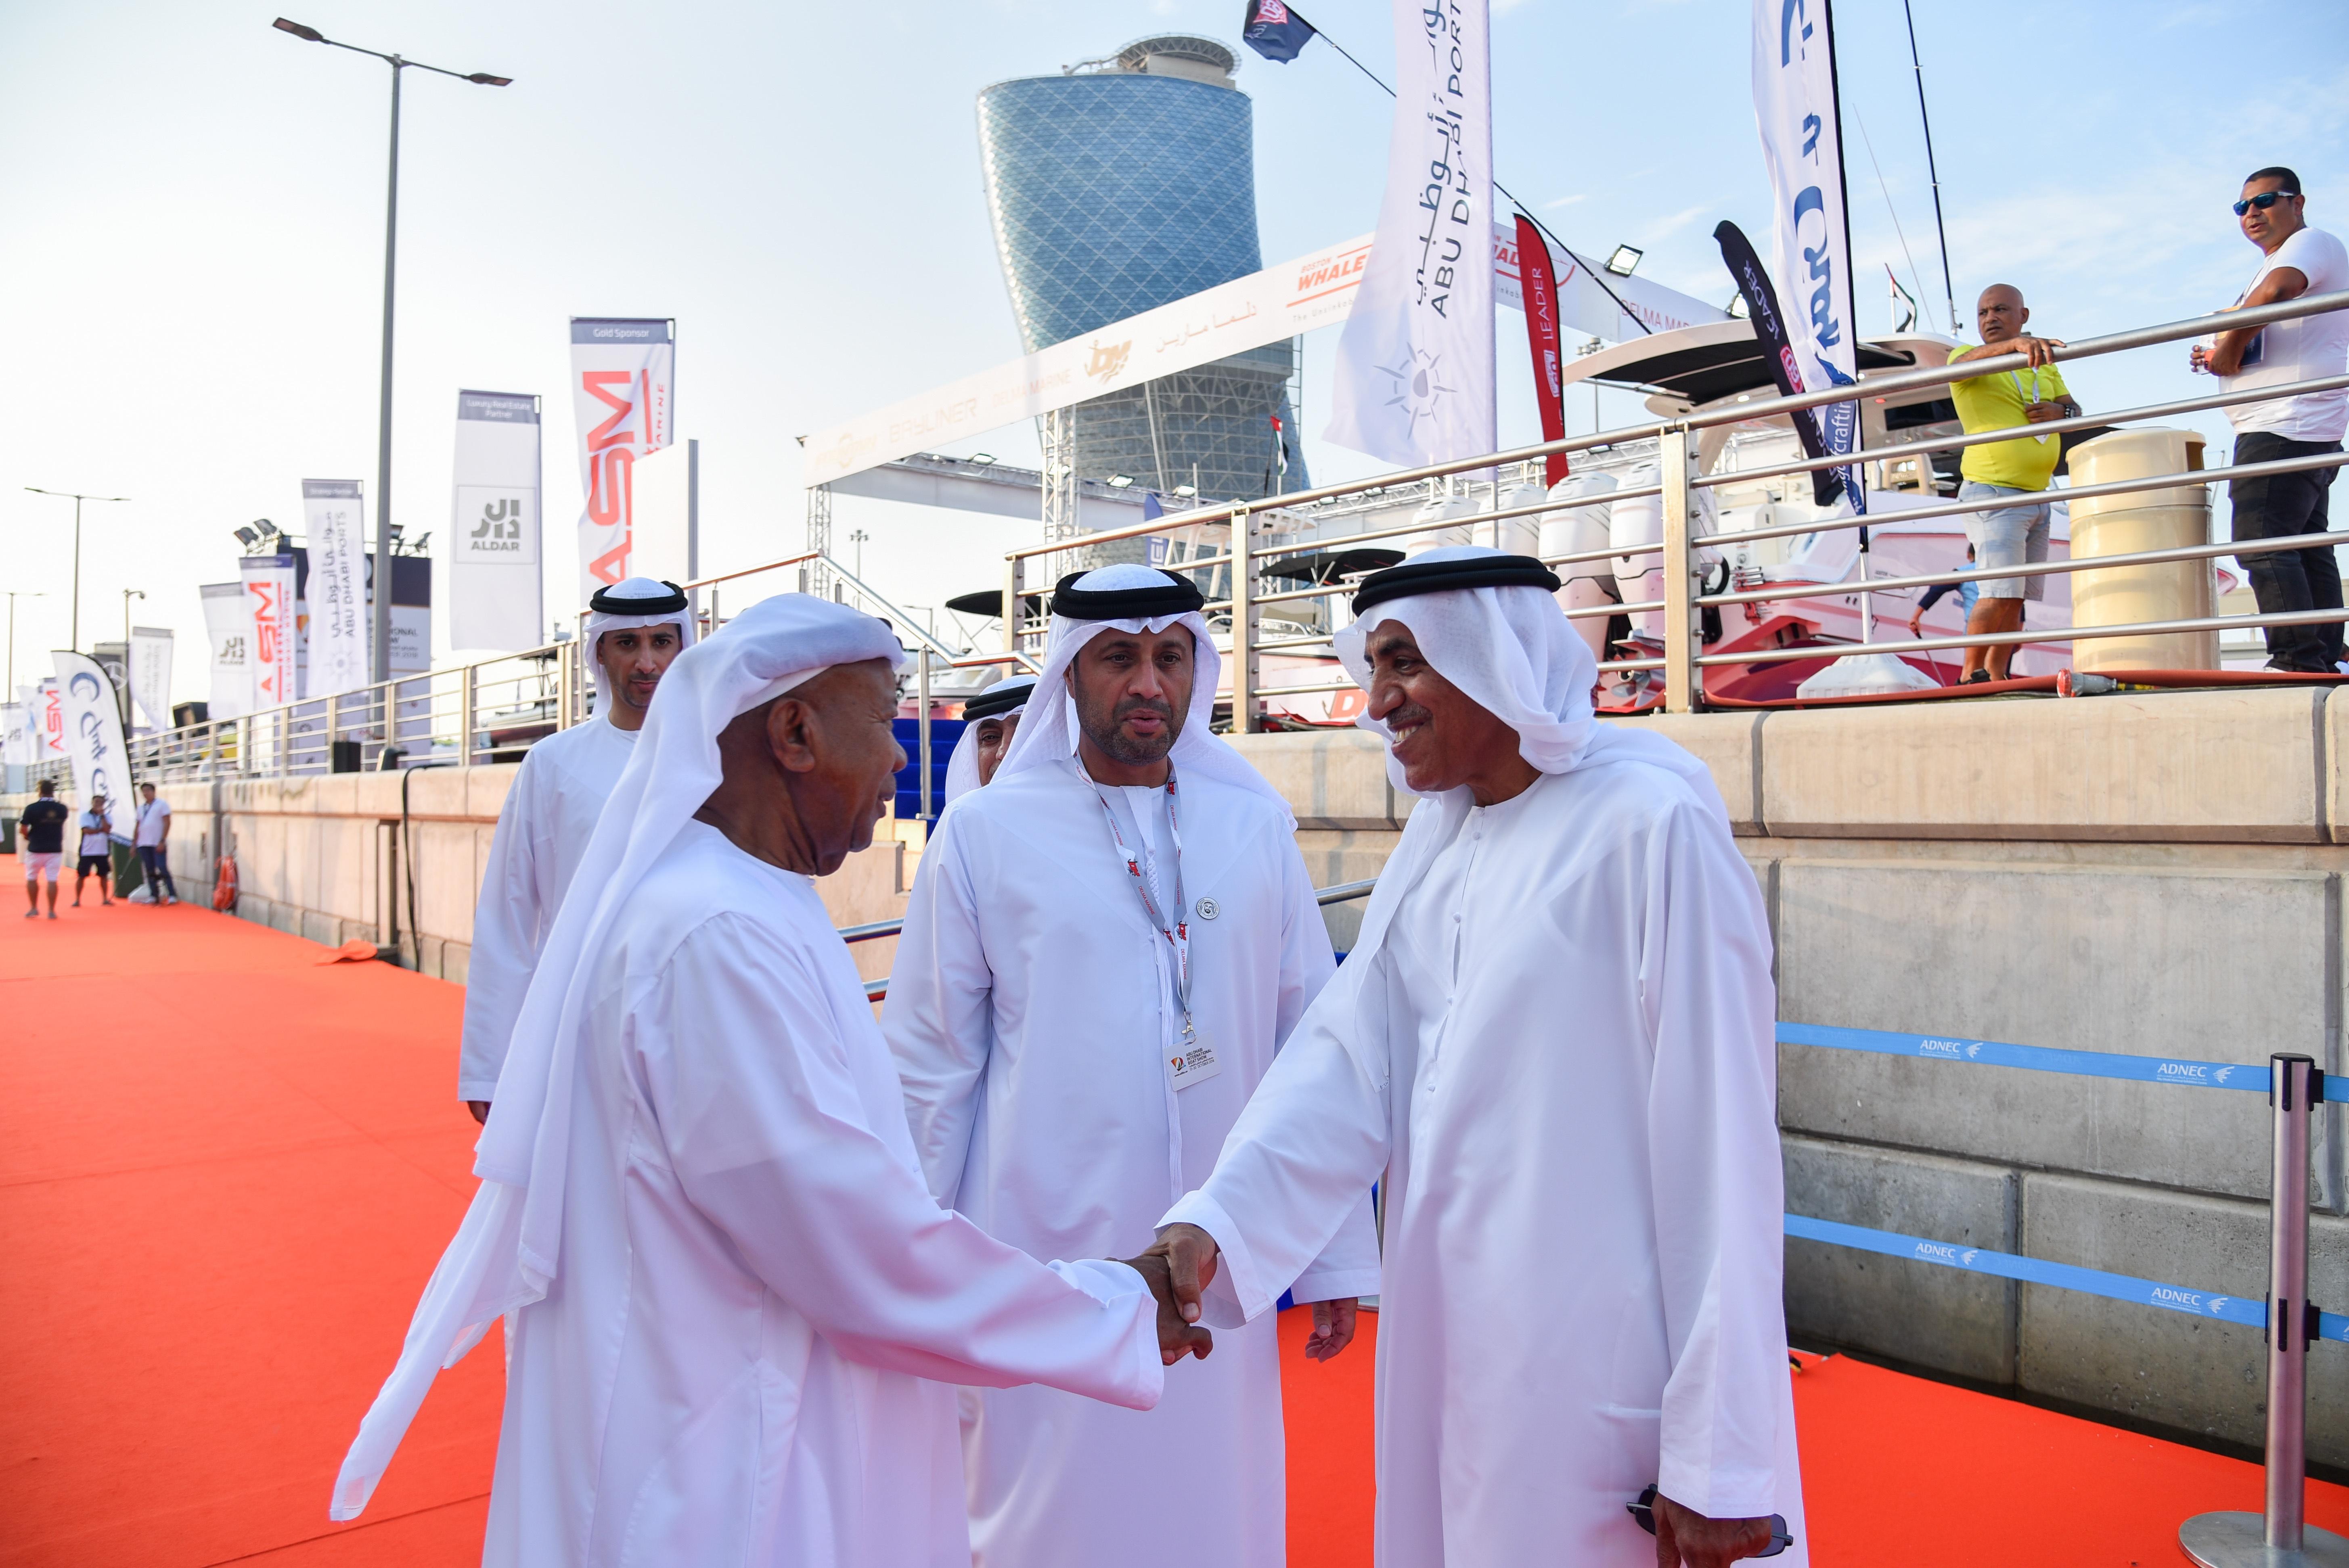 Gulf Craft at Abu Dhabi Boat Show 2018 Day 2 (3).jpg